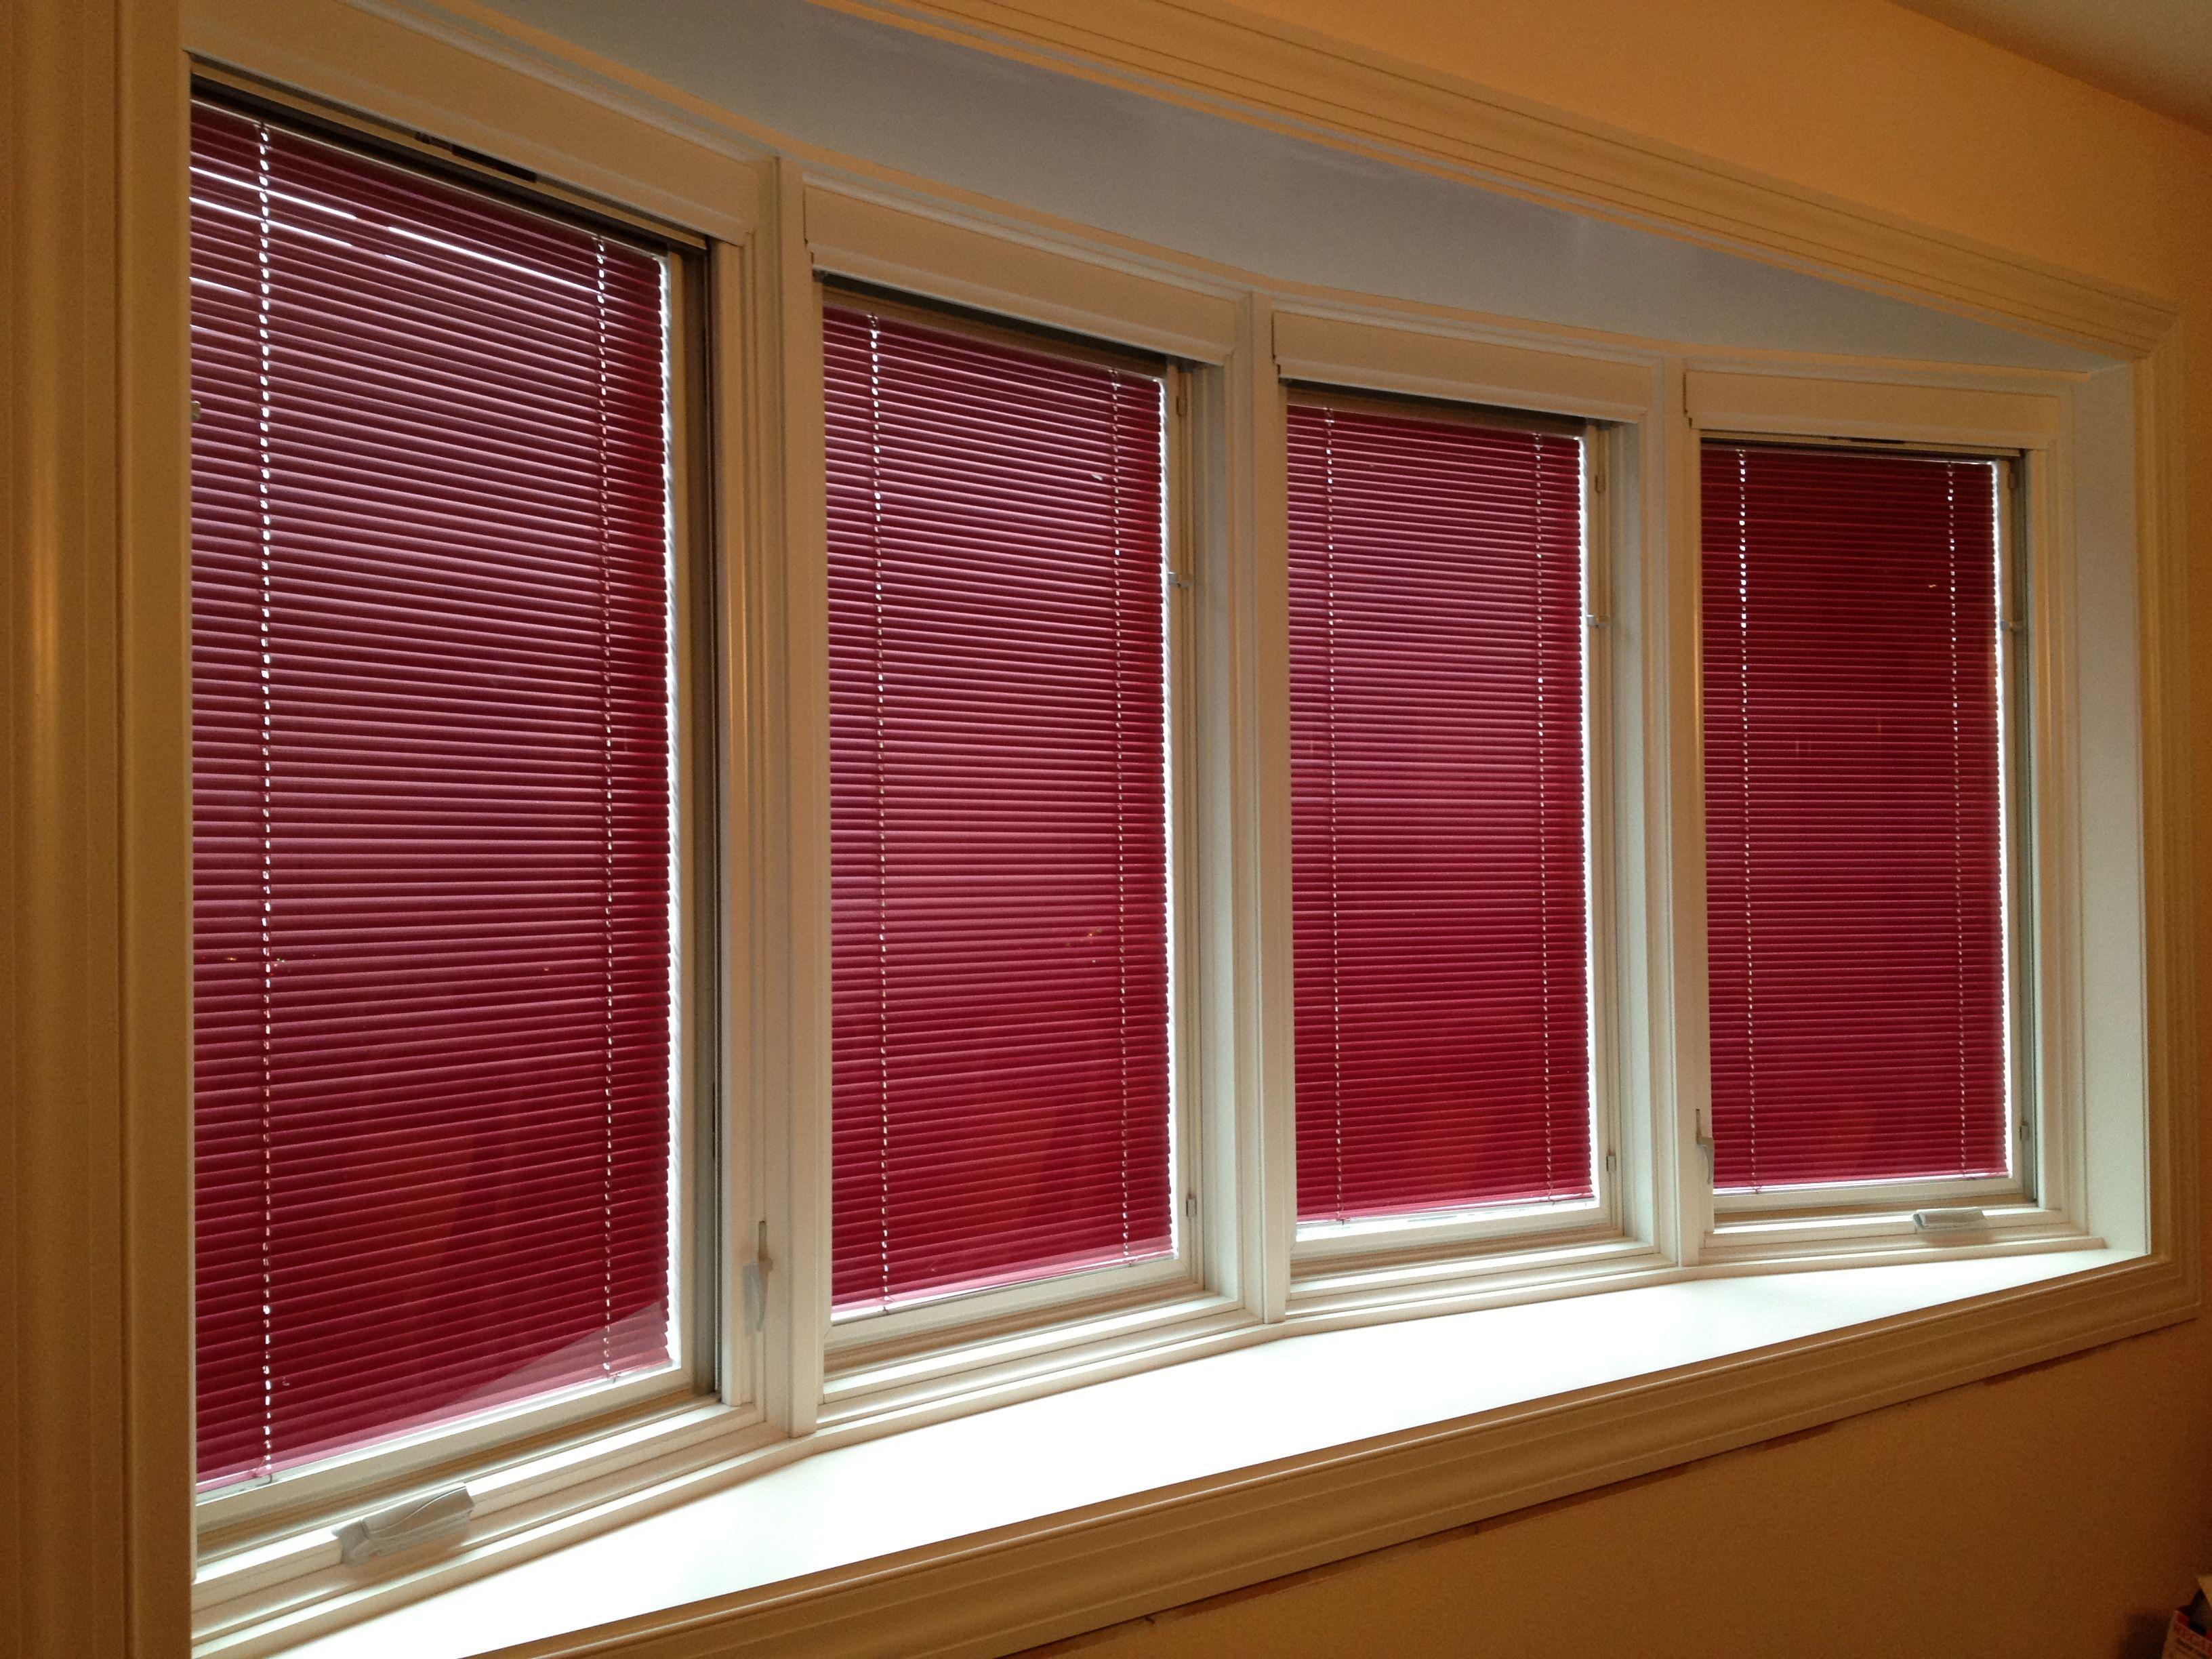 Pella bow window ideas para el estudio caba a pinterest for Bow window treatments pictures